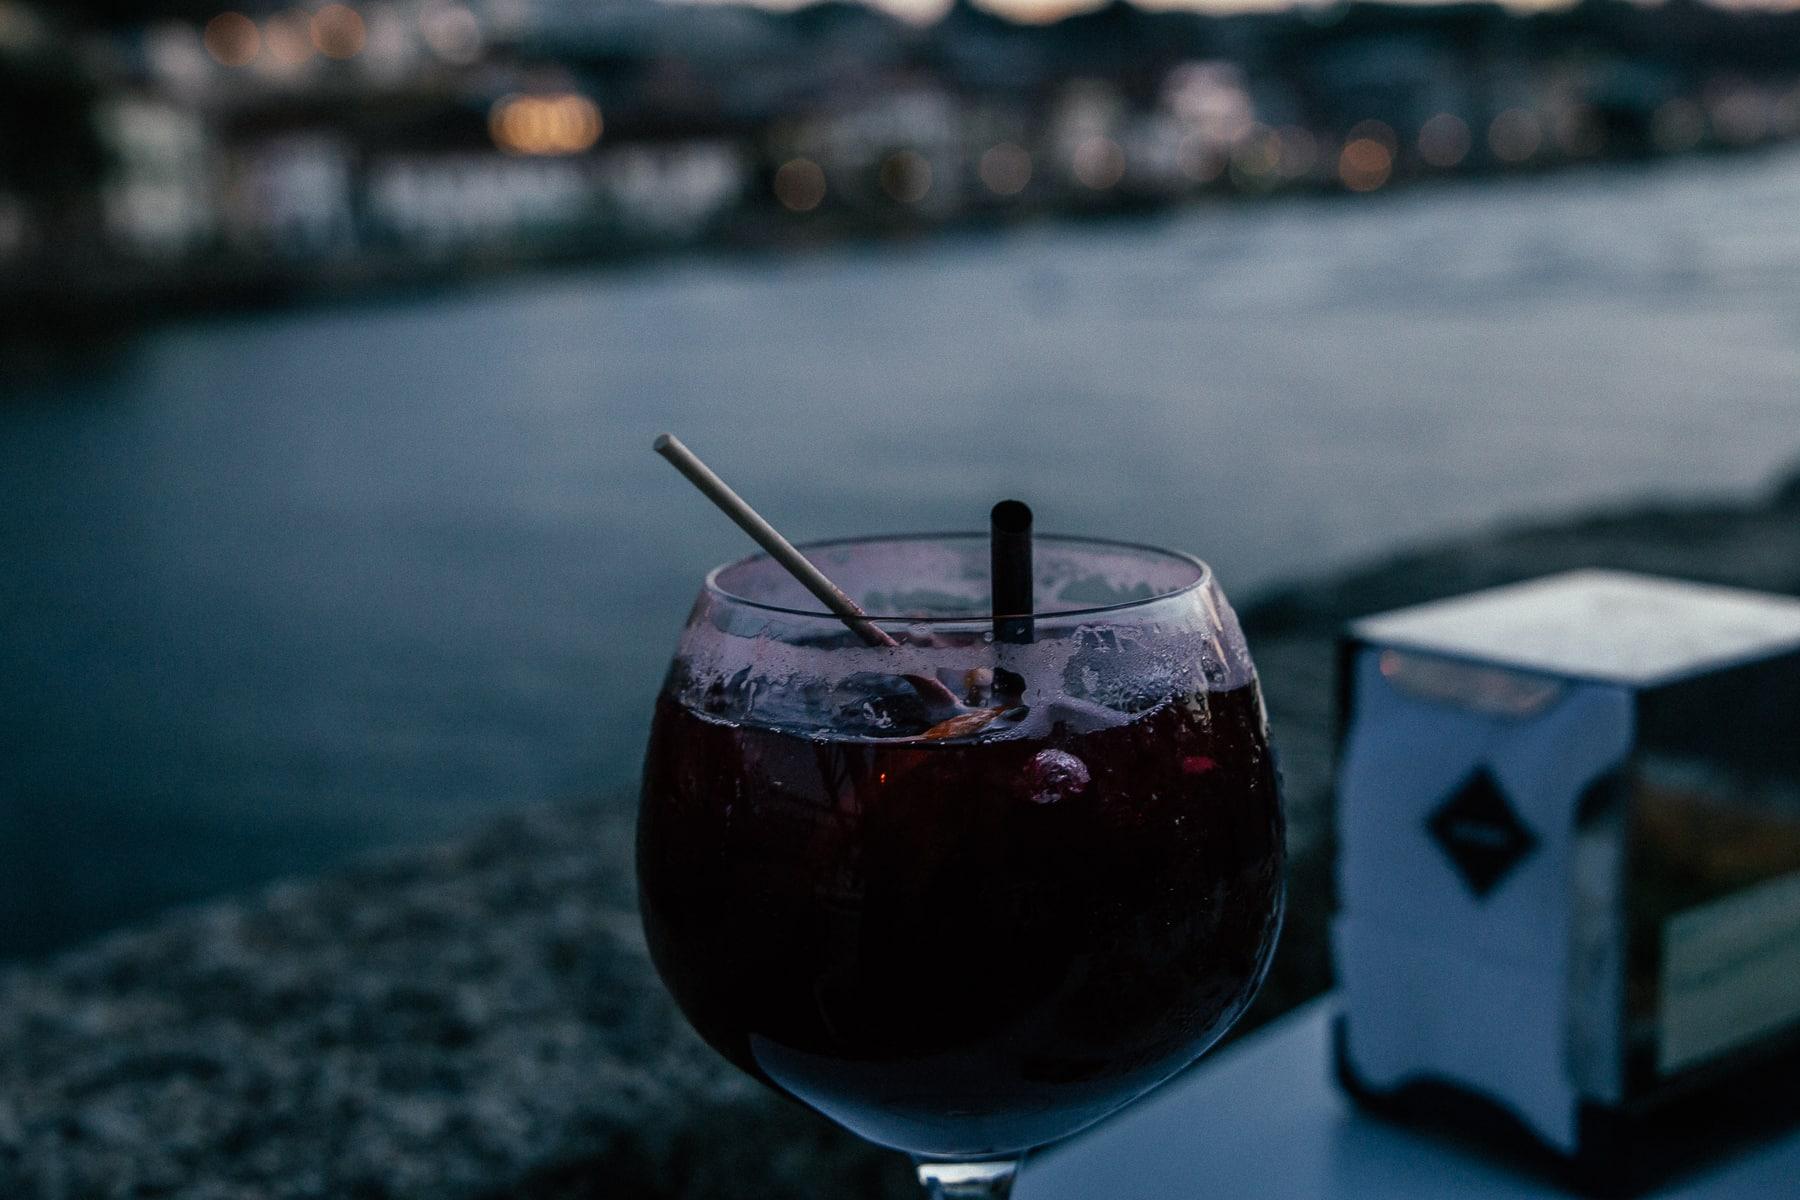 zehn-porto-tipps-fuer-deine-staedtereise-in-portugal-reiseblog-des-belles-choses 30